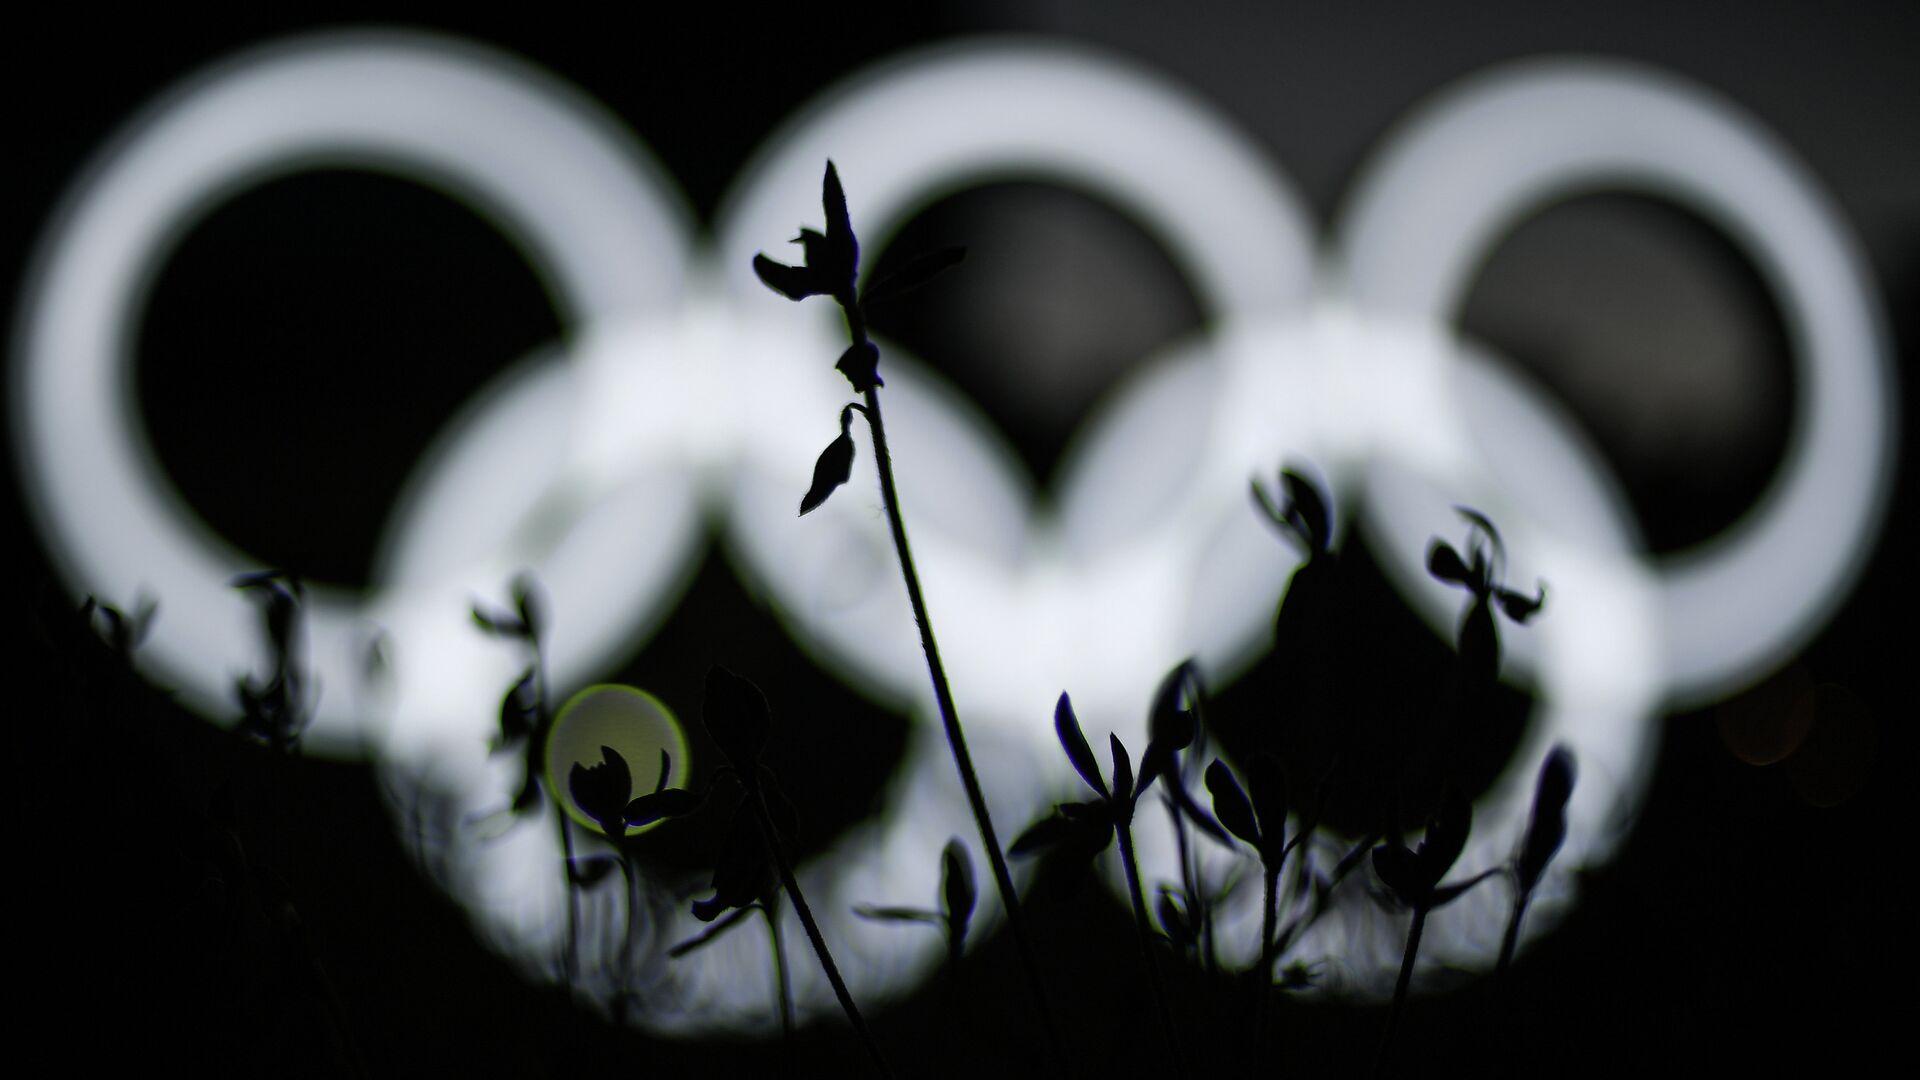 Олимпийские кольца - РИА Новости, 1920, 01.08.2021